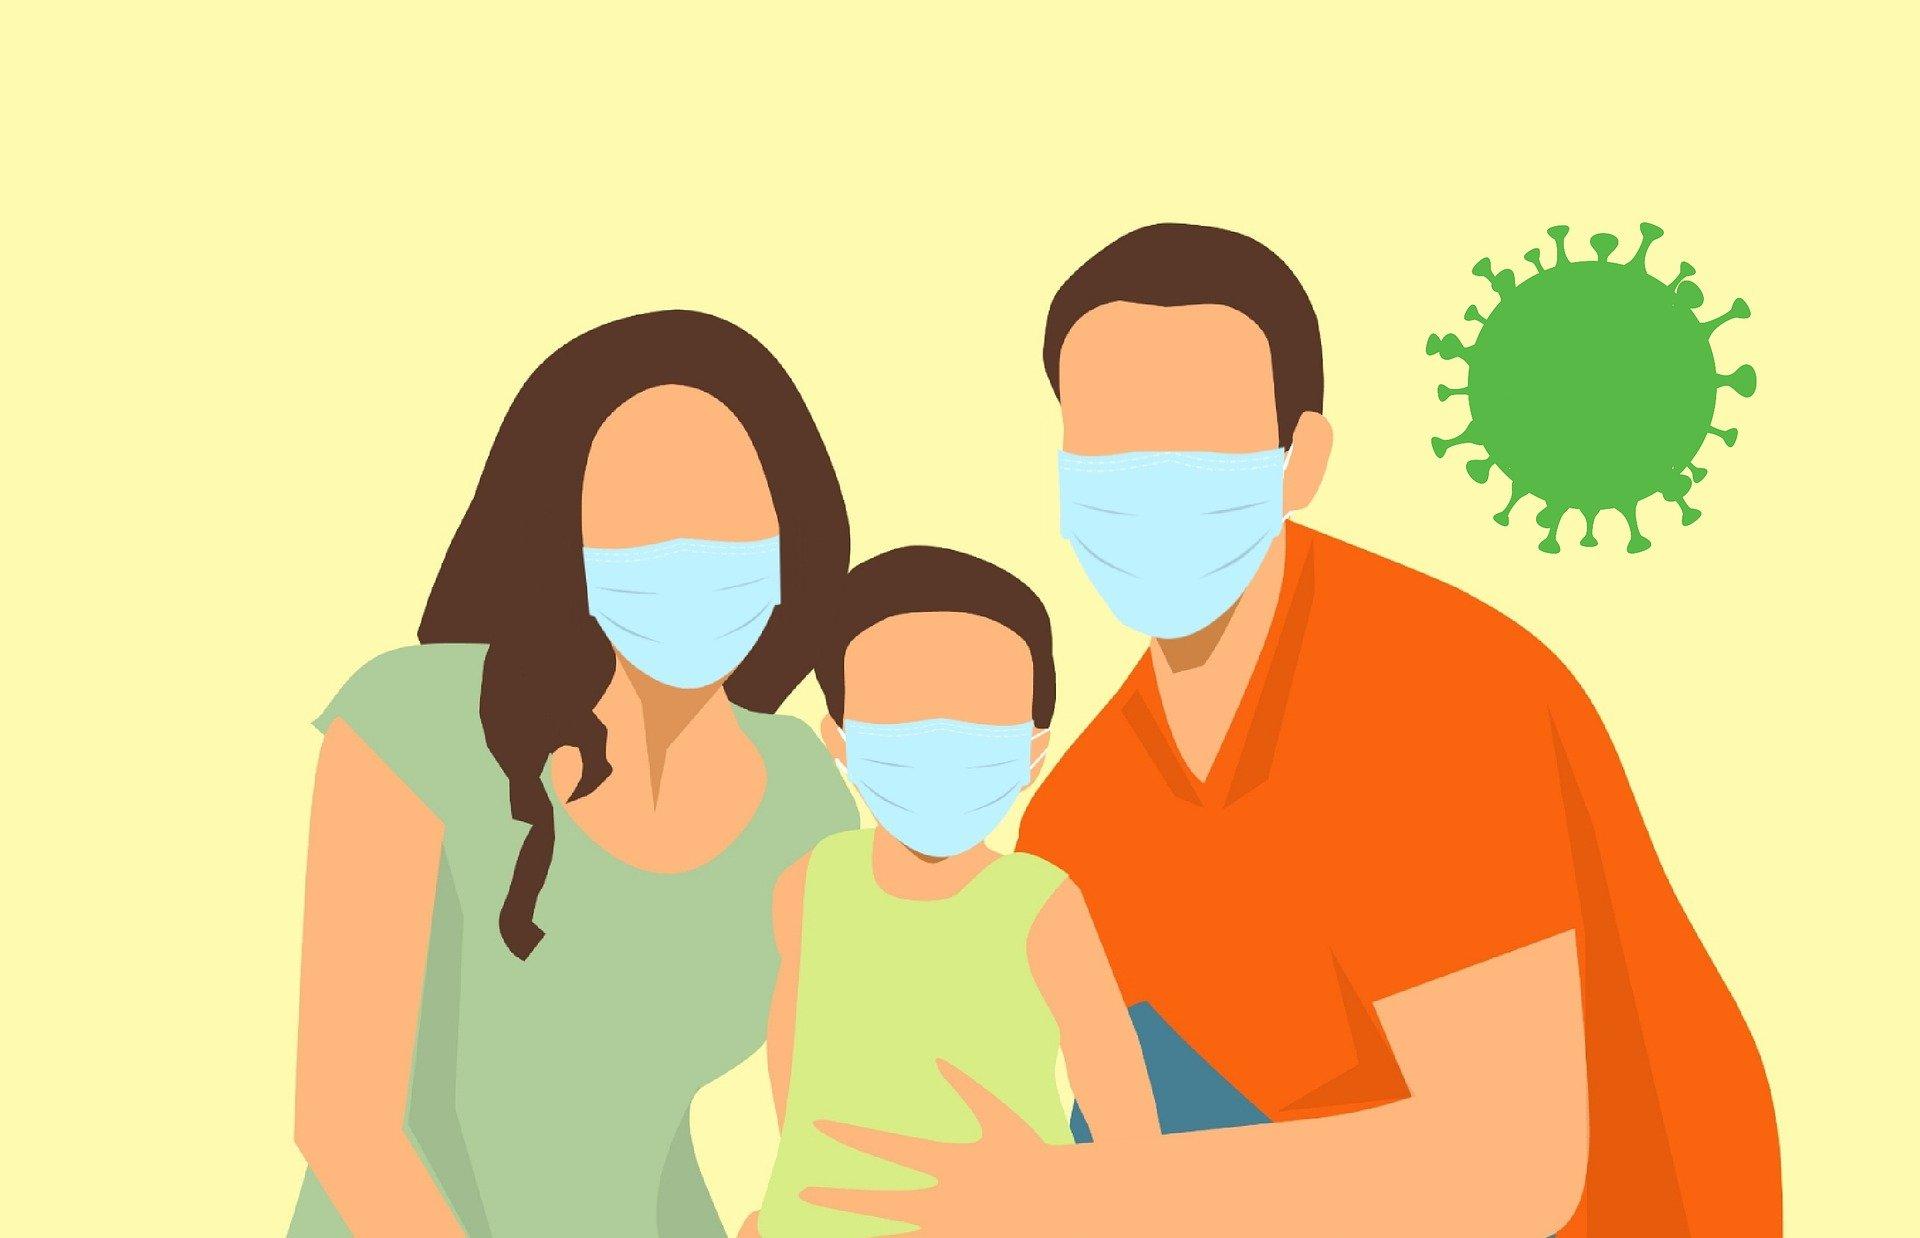 covid-19 vaccine. mask. coronavirus. covid. corona. family. www.blisslife.in